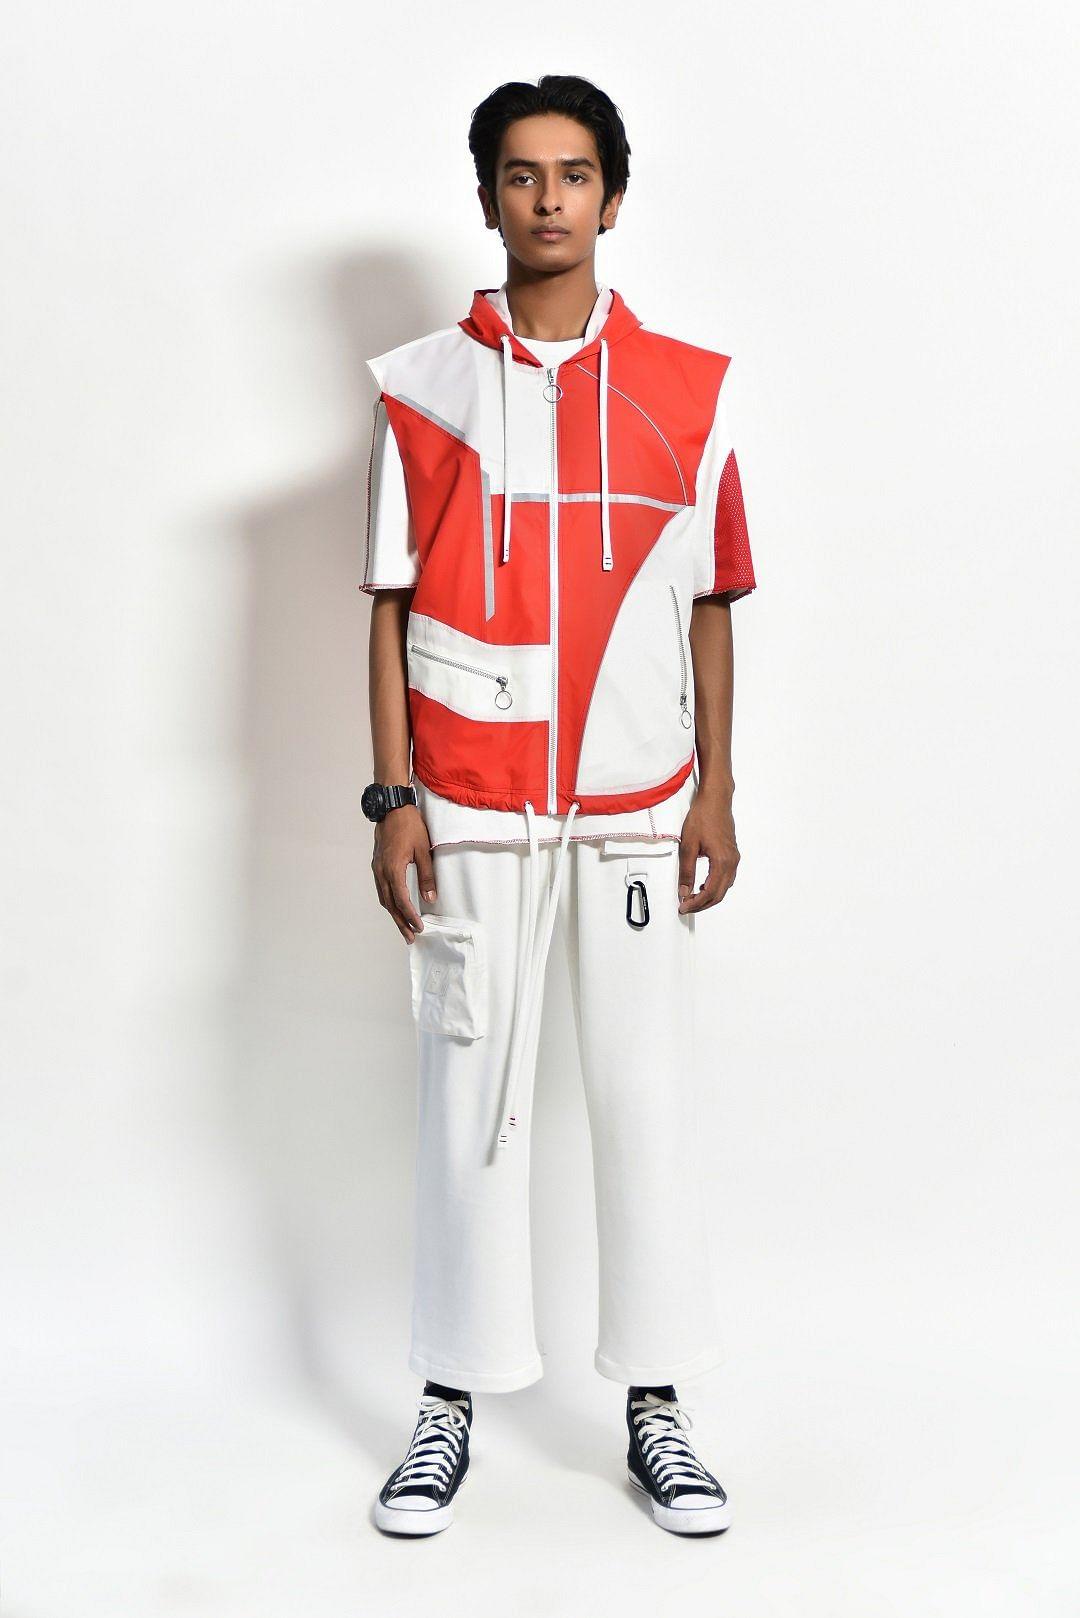 NoughtOne's Active Gilet Jacket